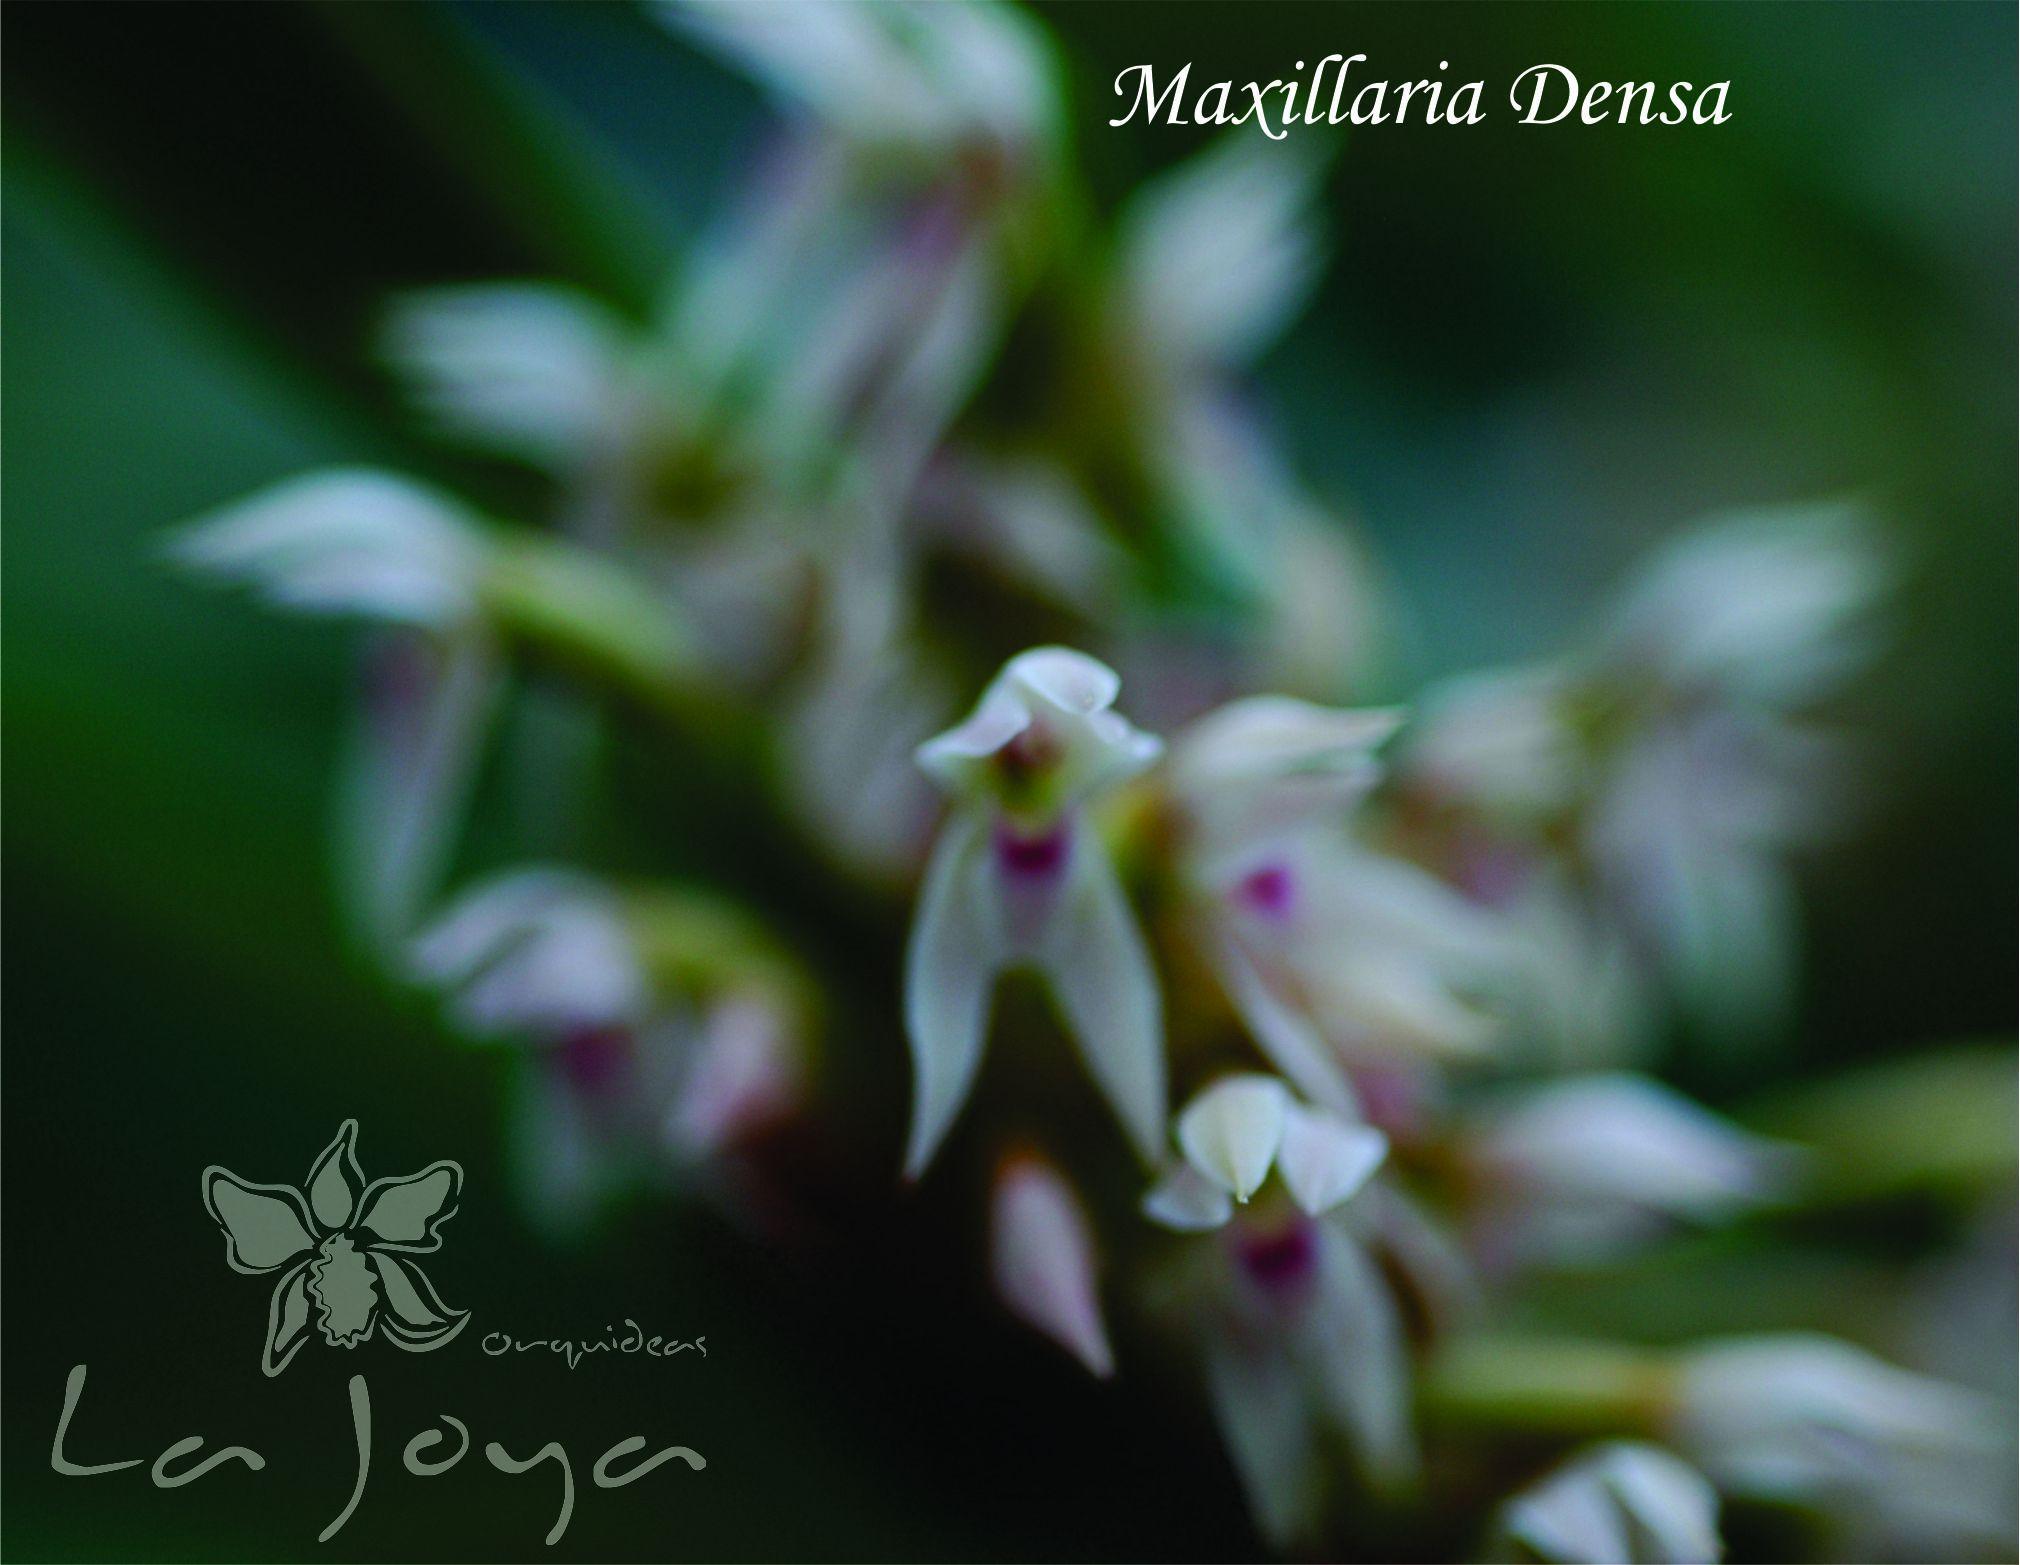 Maxillaria Densa